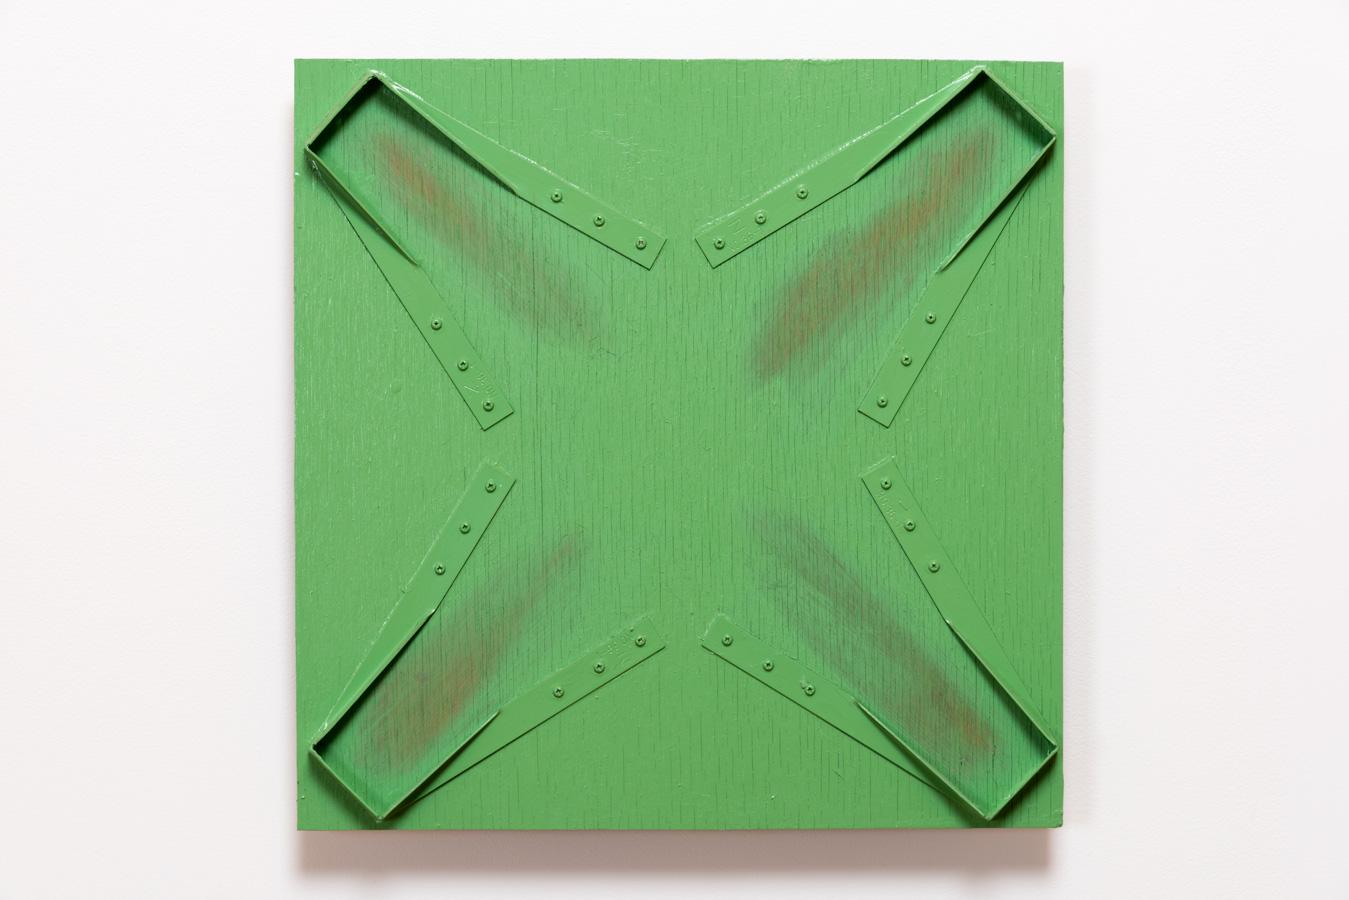 Multiple Directions , 2006 多向様中 ( Takōyōchū ) Wood, steel, acrylic 15 3/4 x 15 3/4 x 2 1/2 inches 40 x 40 x 6.5 cm